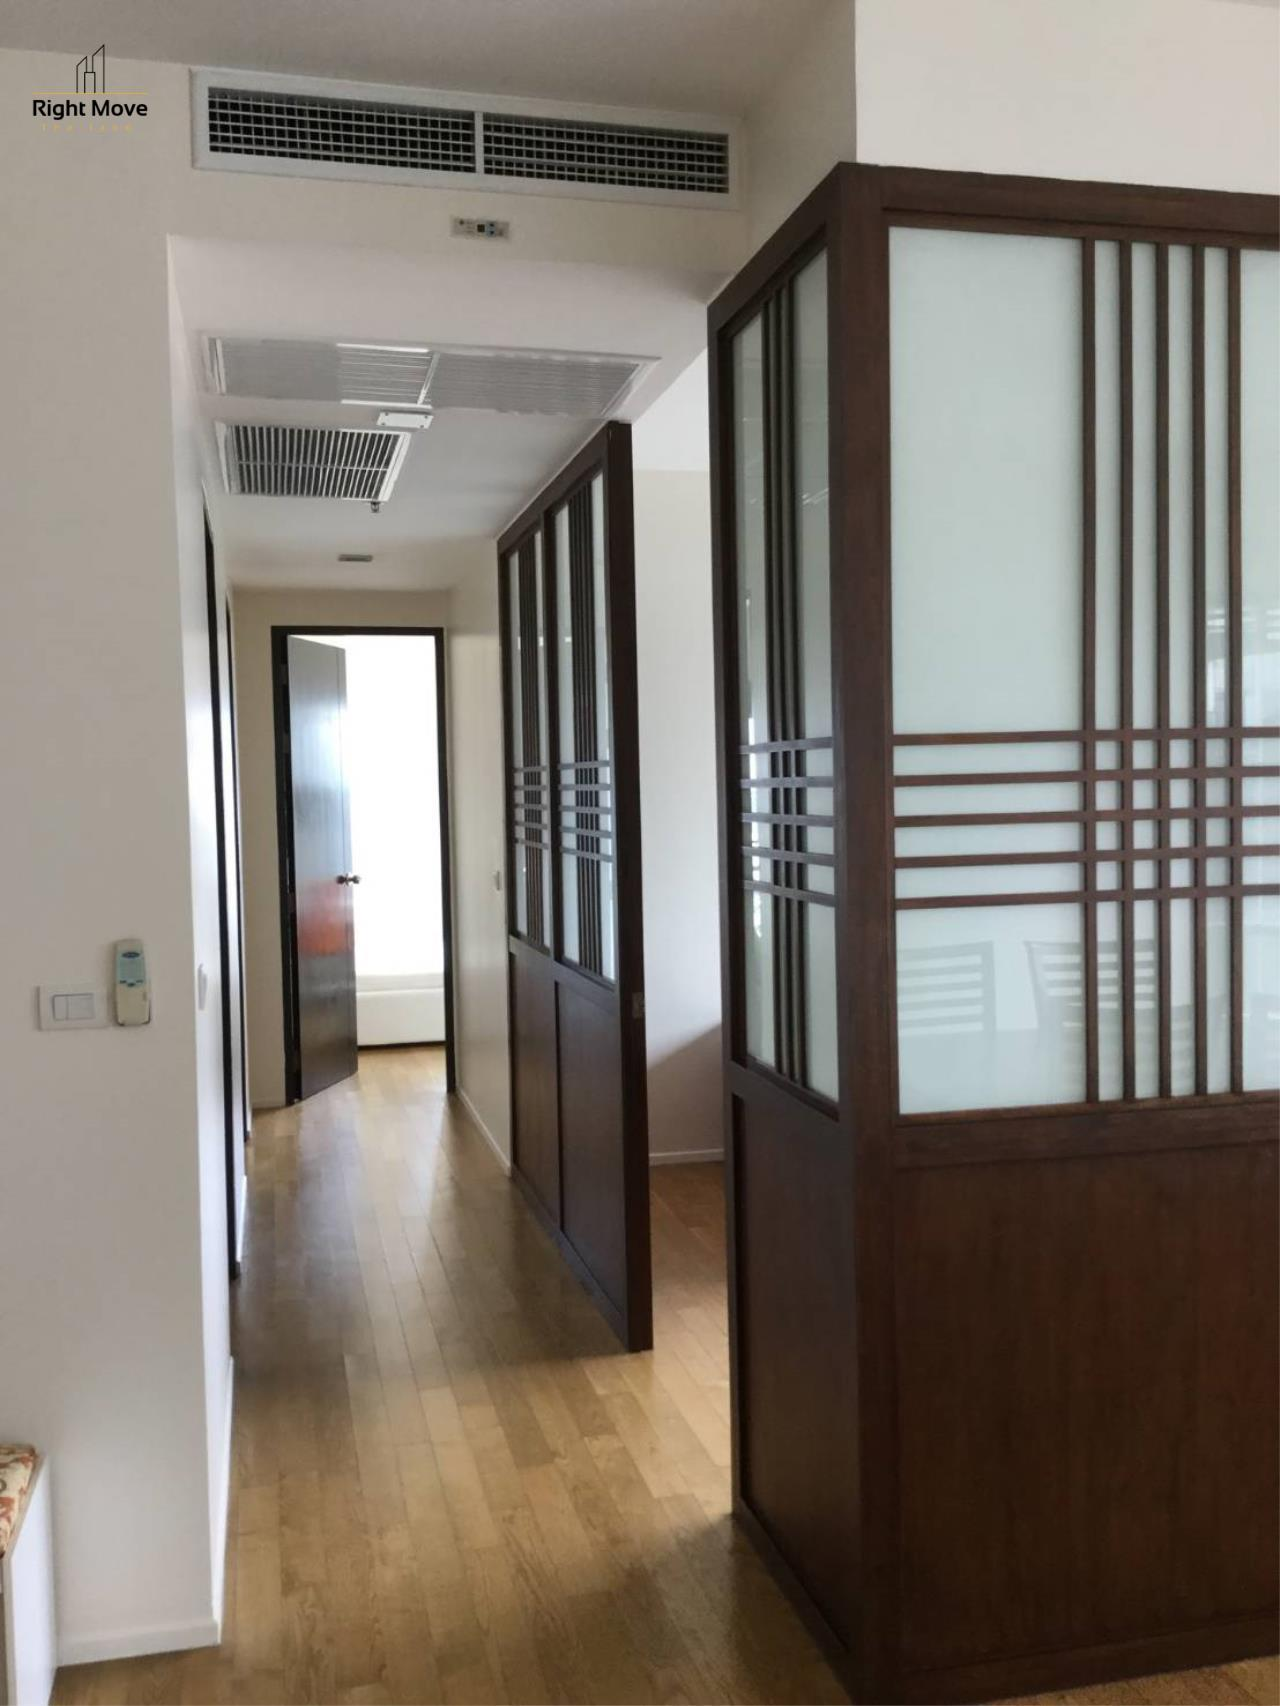 Right Move Thailand Agency's CA5486 Madison Condominium For Rent 90,000 THB - 3 Bedrooms - 160 sqm. 10